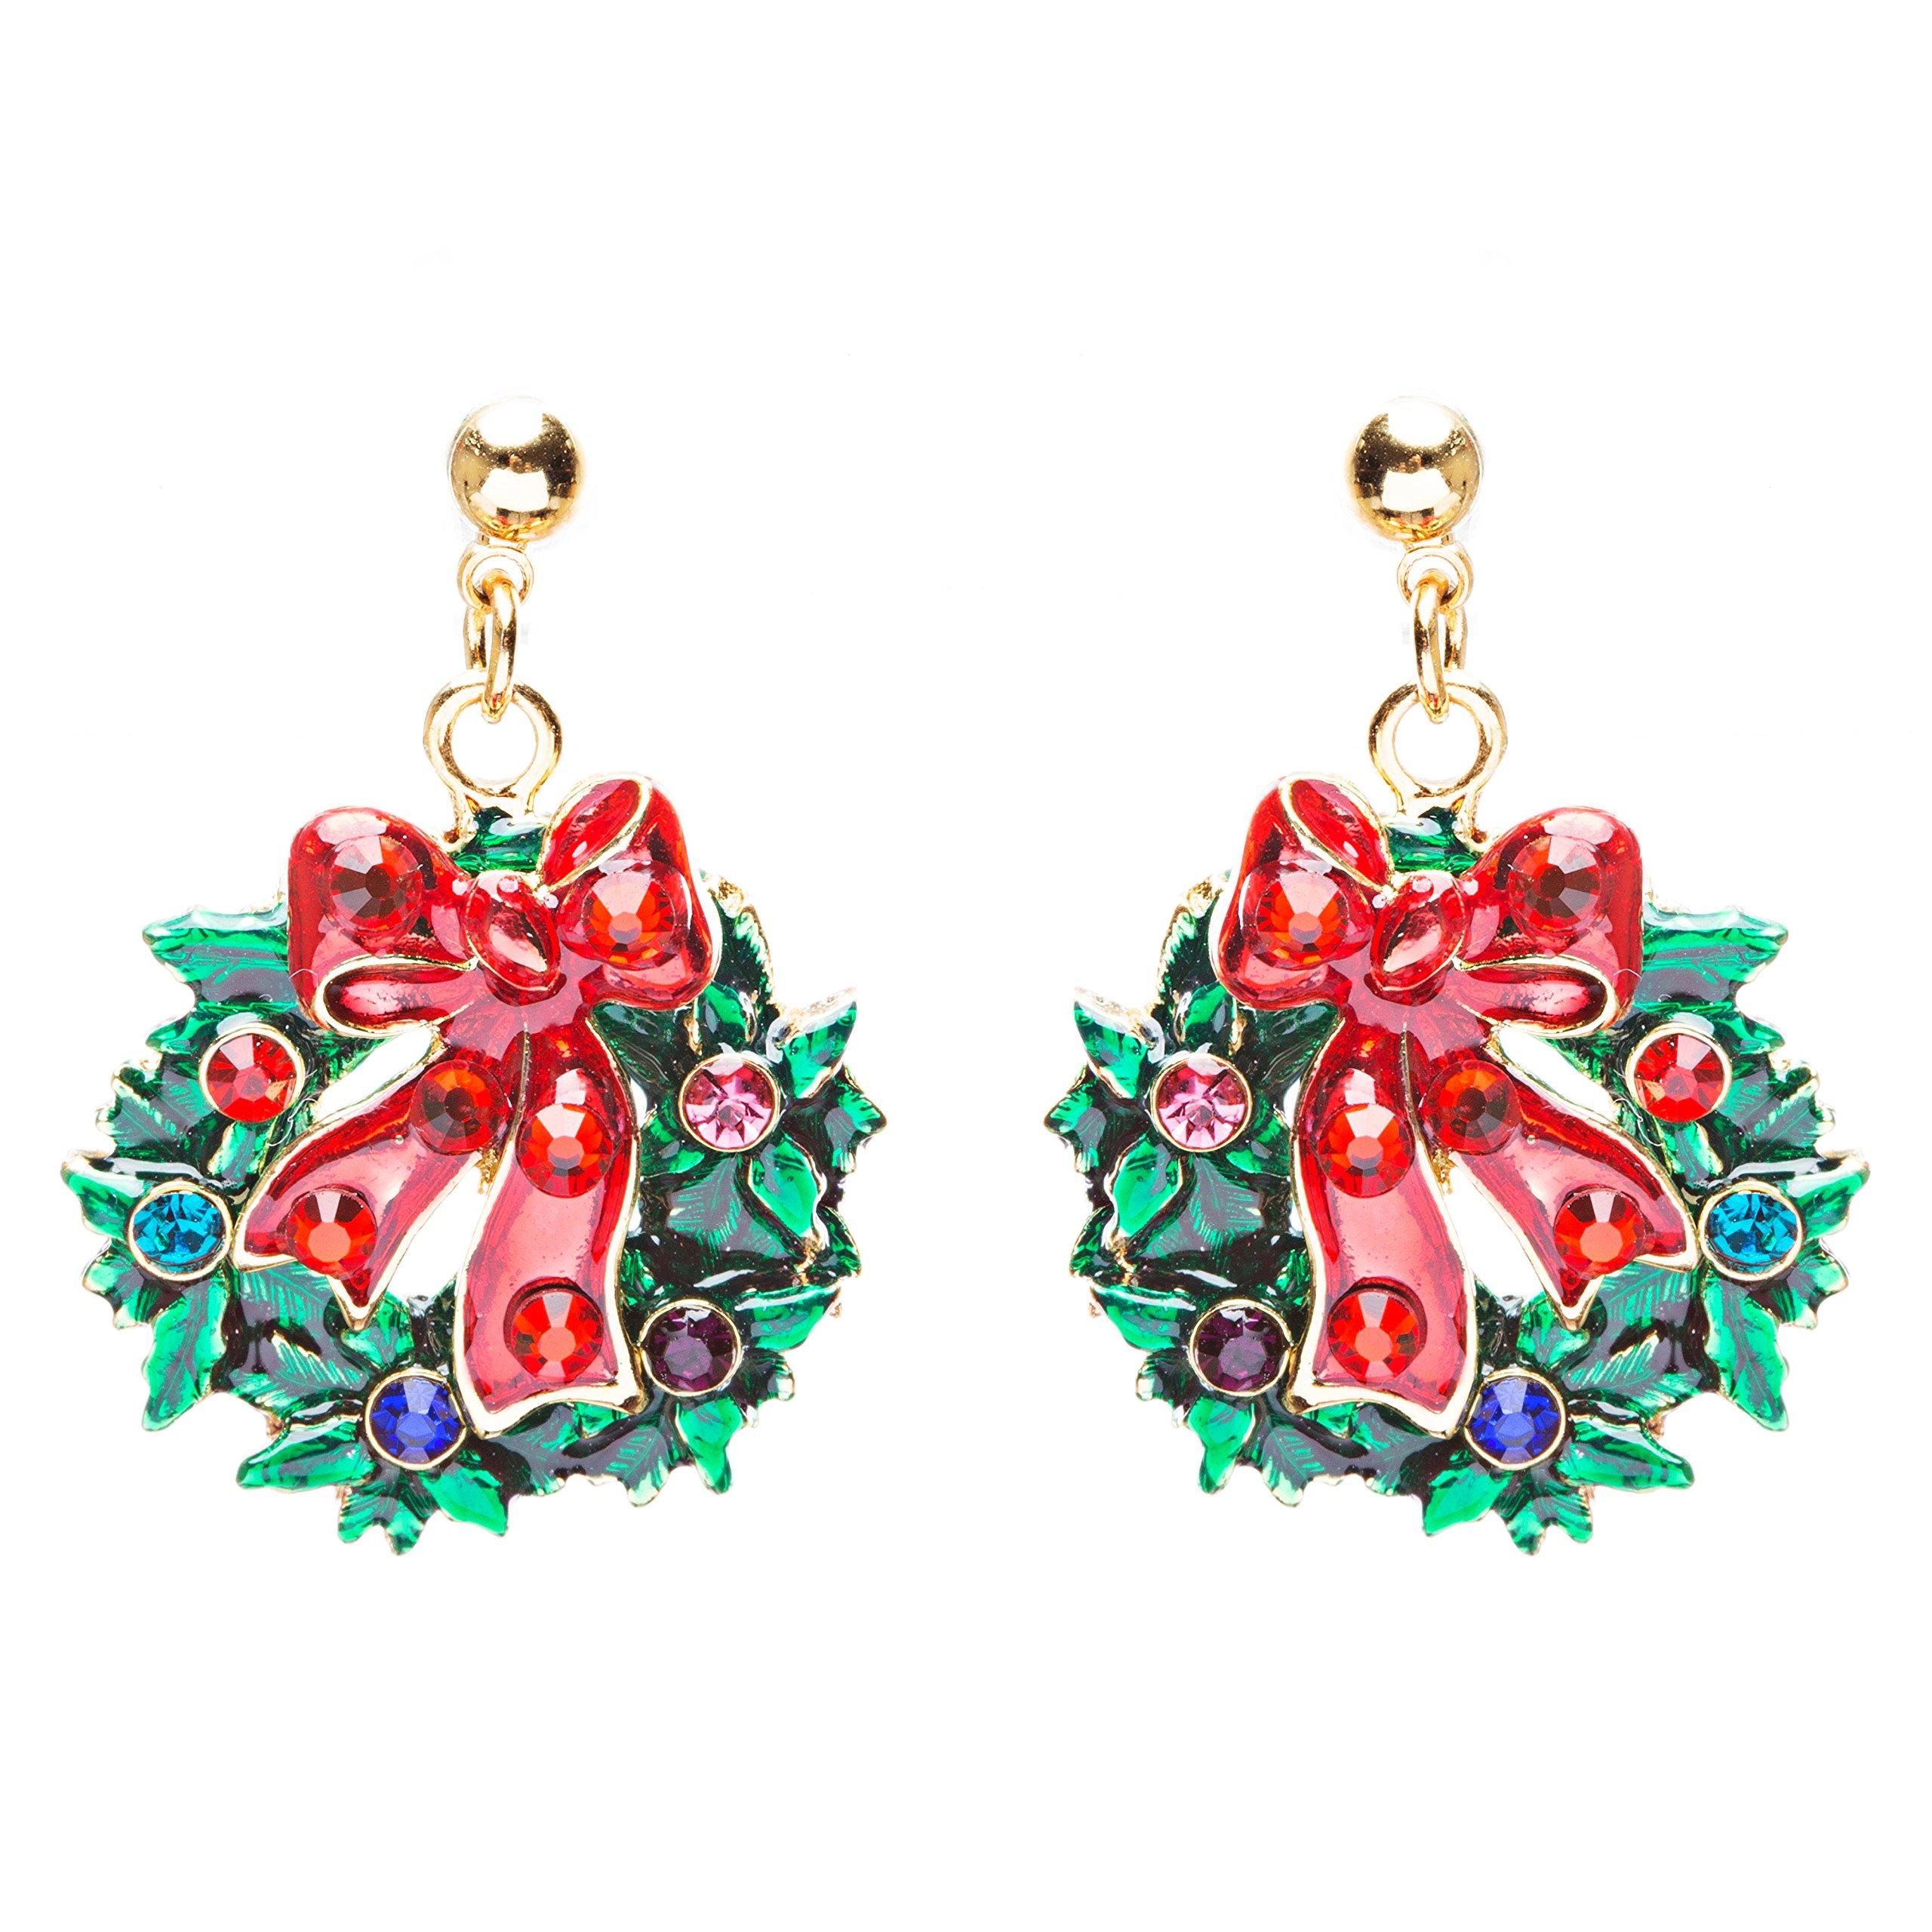 ACCESSORIESFOREVER Women Christmas Jewelry Crystal Rhinestone Santa Wreath Dangle Charm Earrings E879